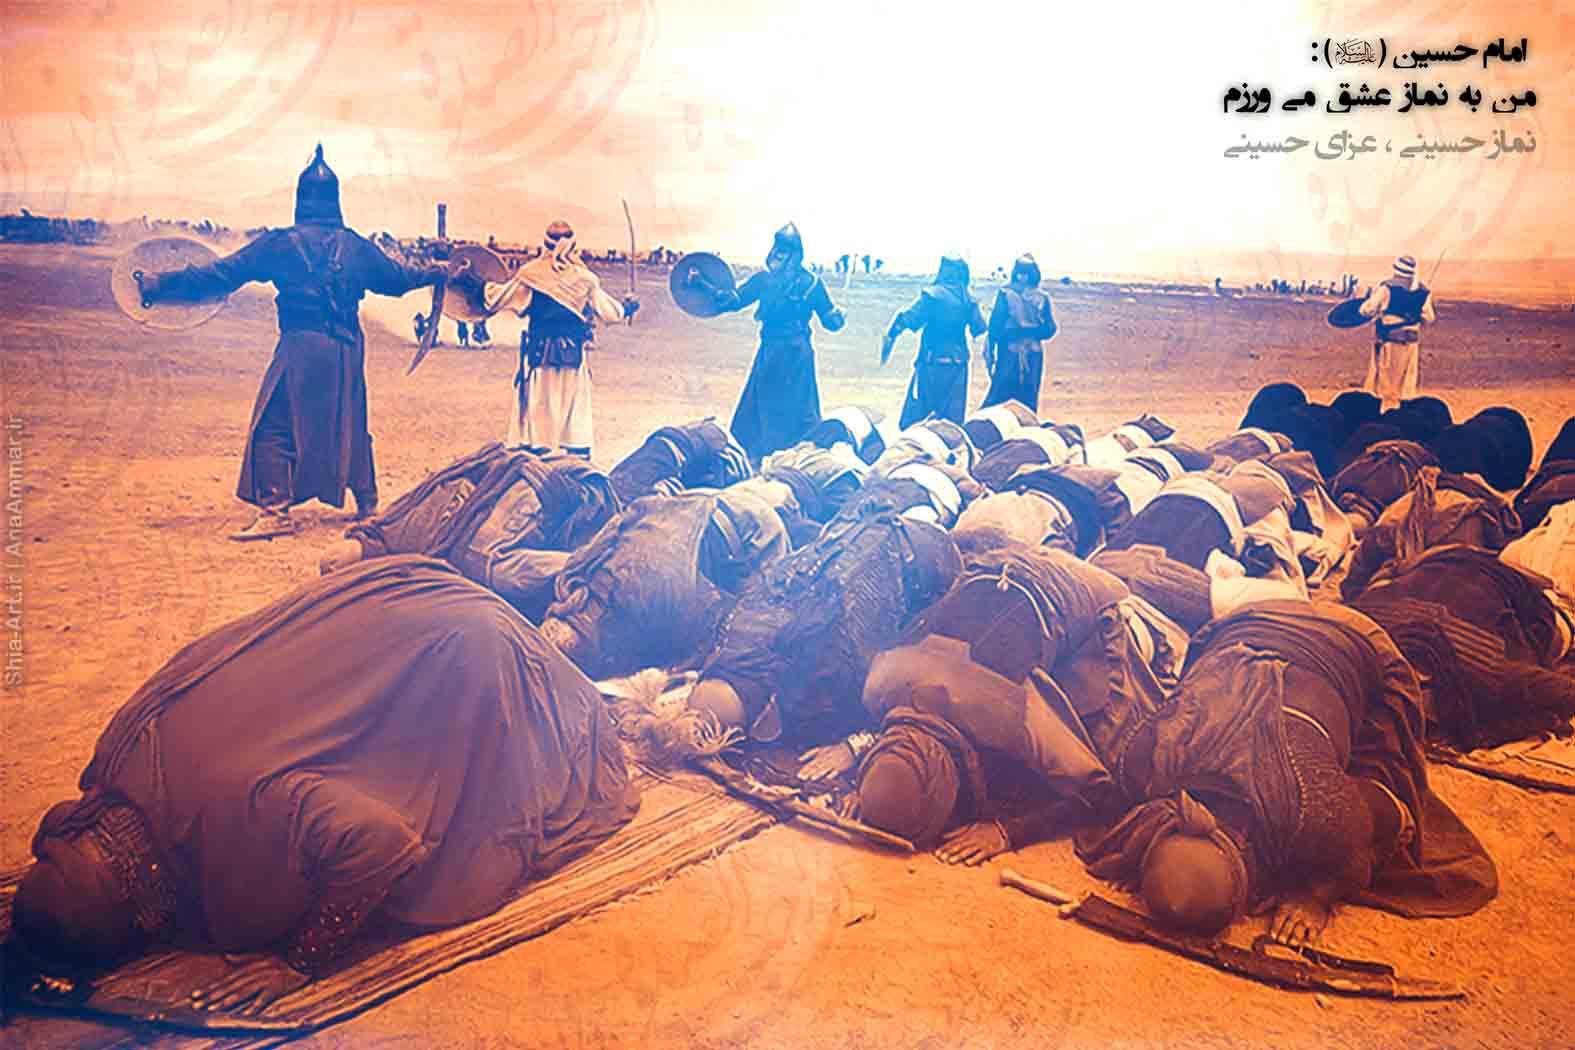 Salat of Imam Hussein in the Battle of Karbala